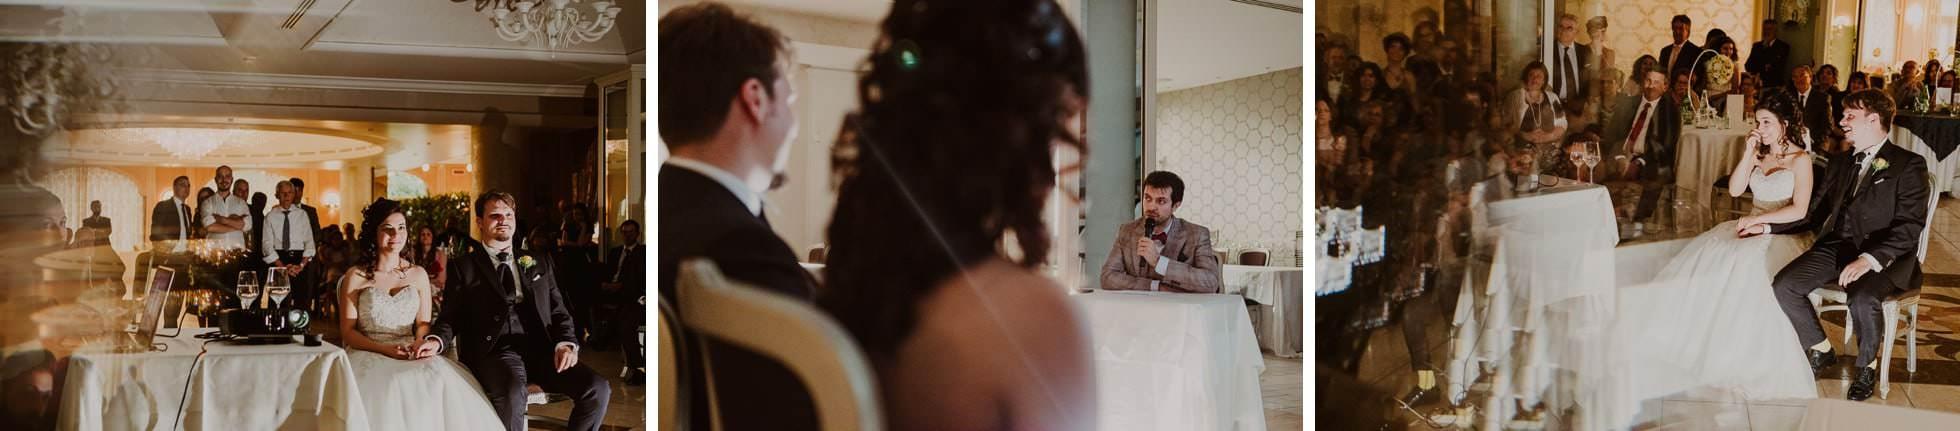 fotografo matrimonio paon dorè